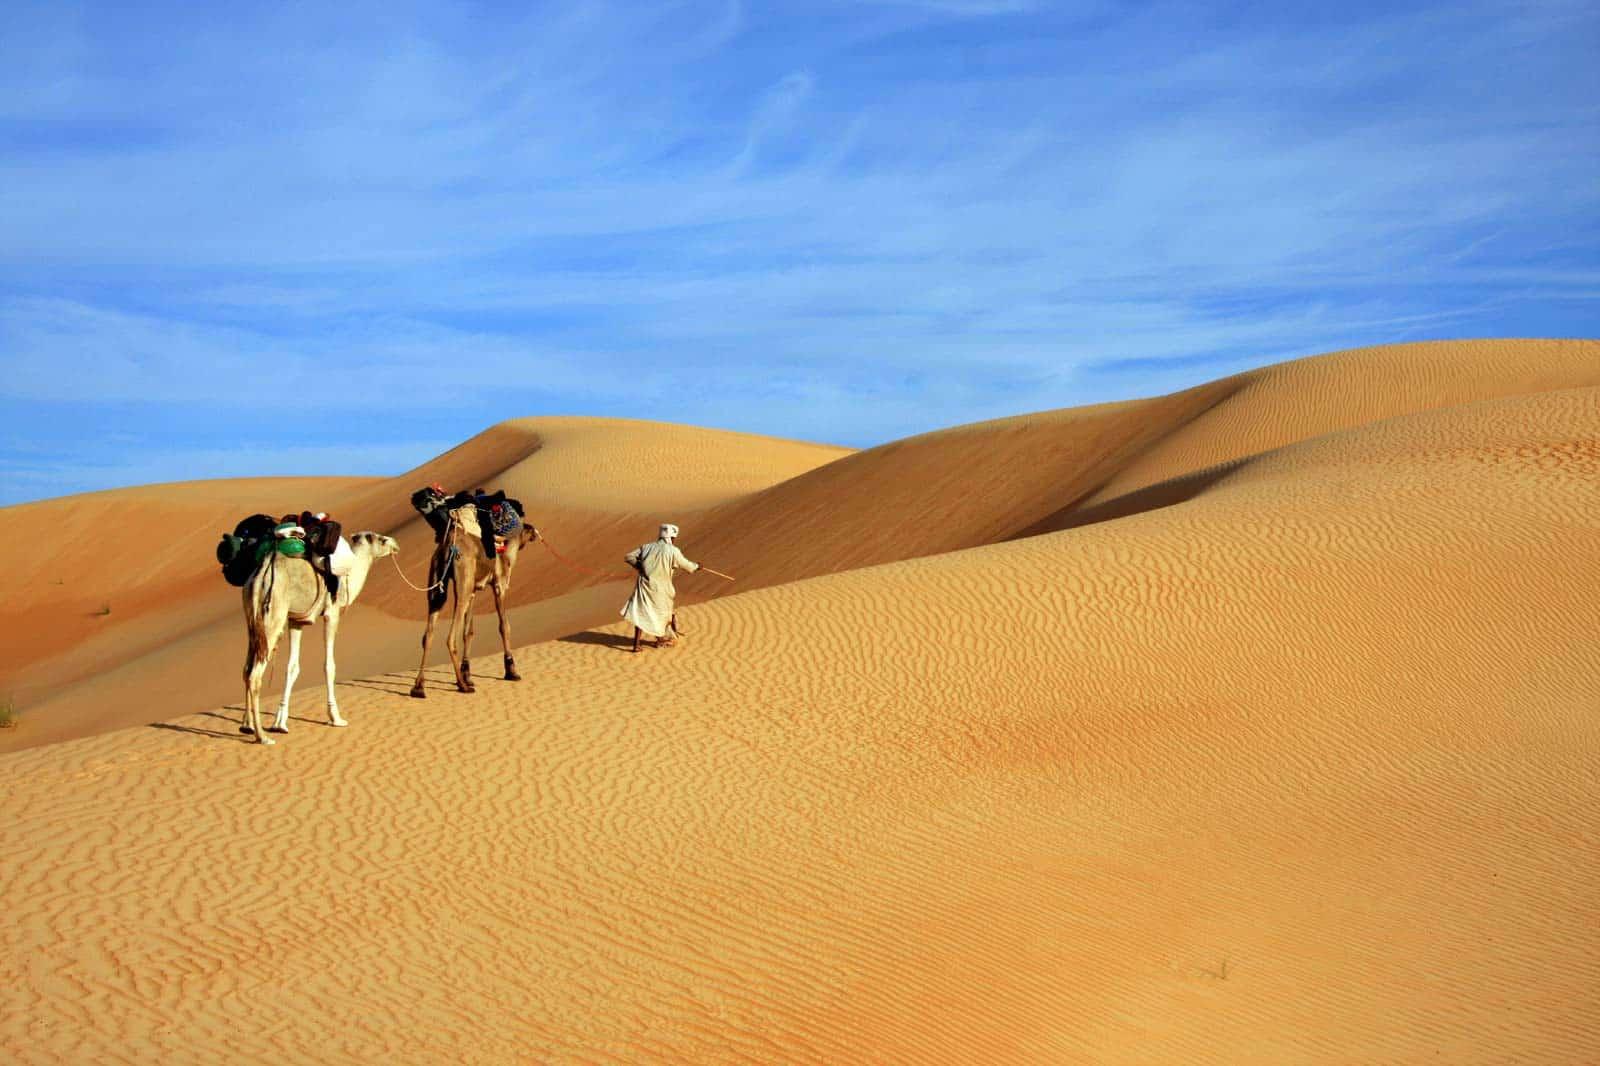 Cammelli nel deserto del Sahara, in Mauritania